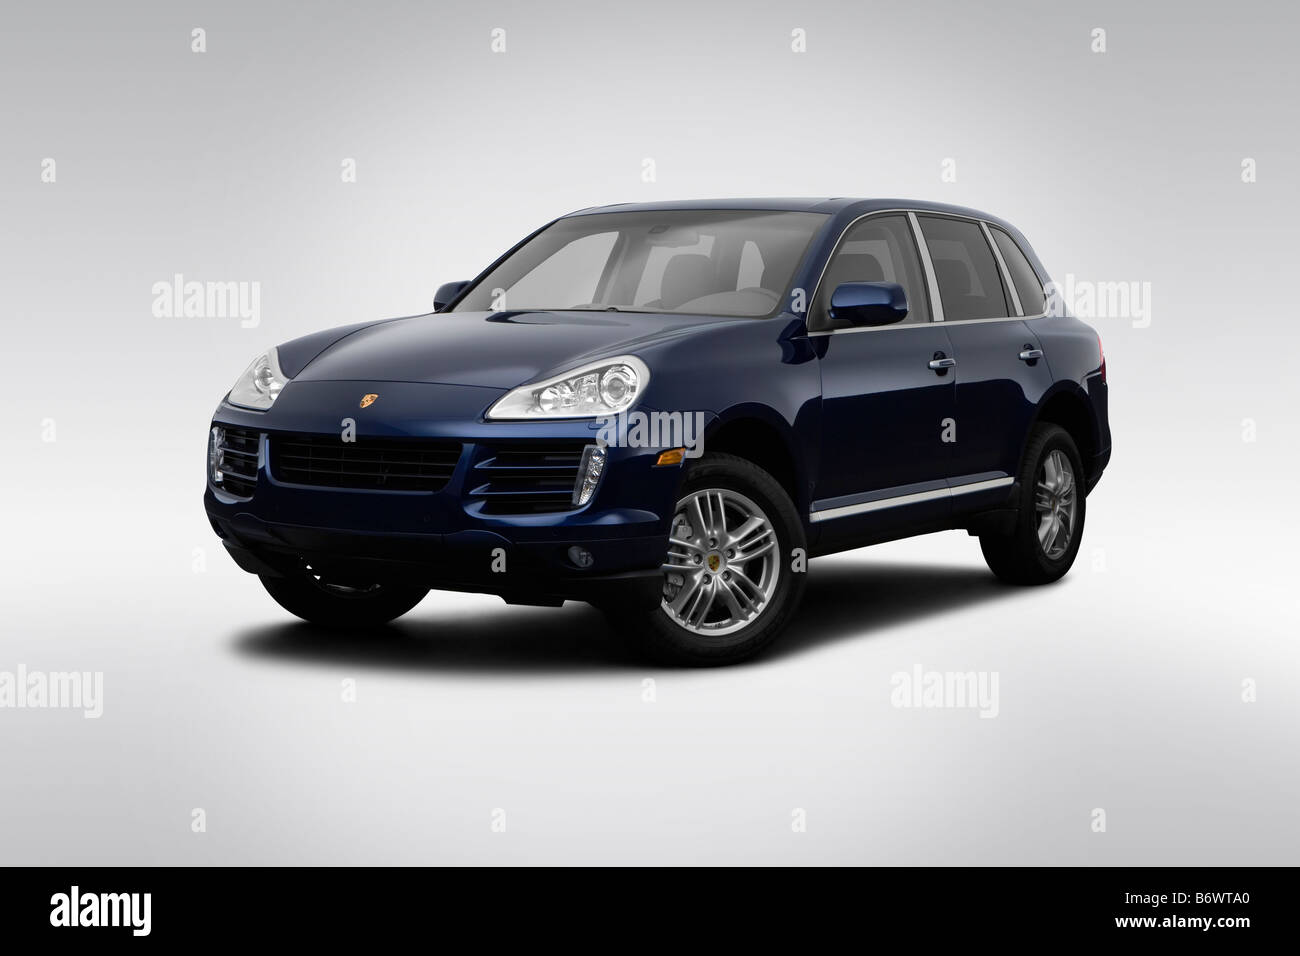 Blue Porsche Stock Photos Amp Blue Porsche Stock Images Alamy